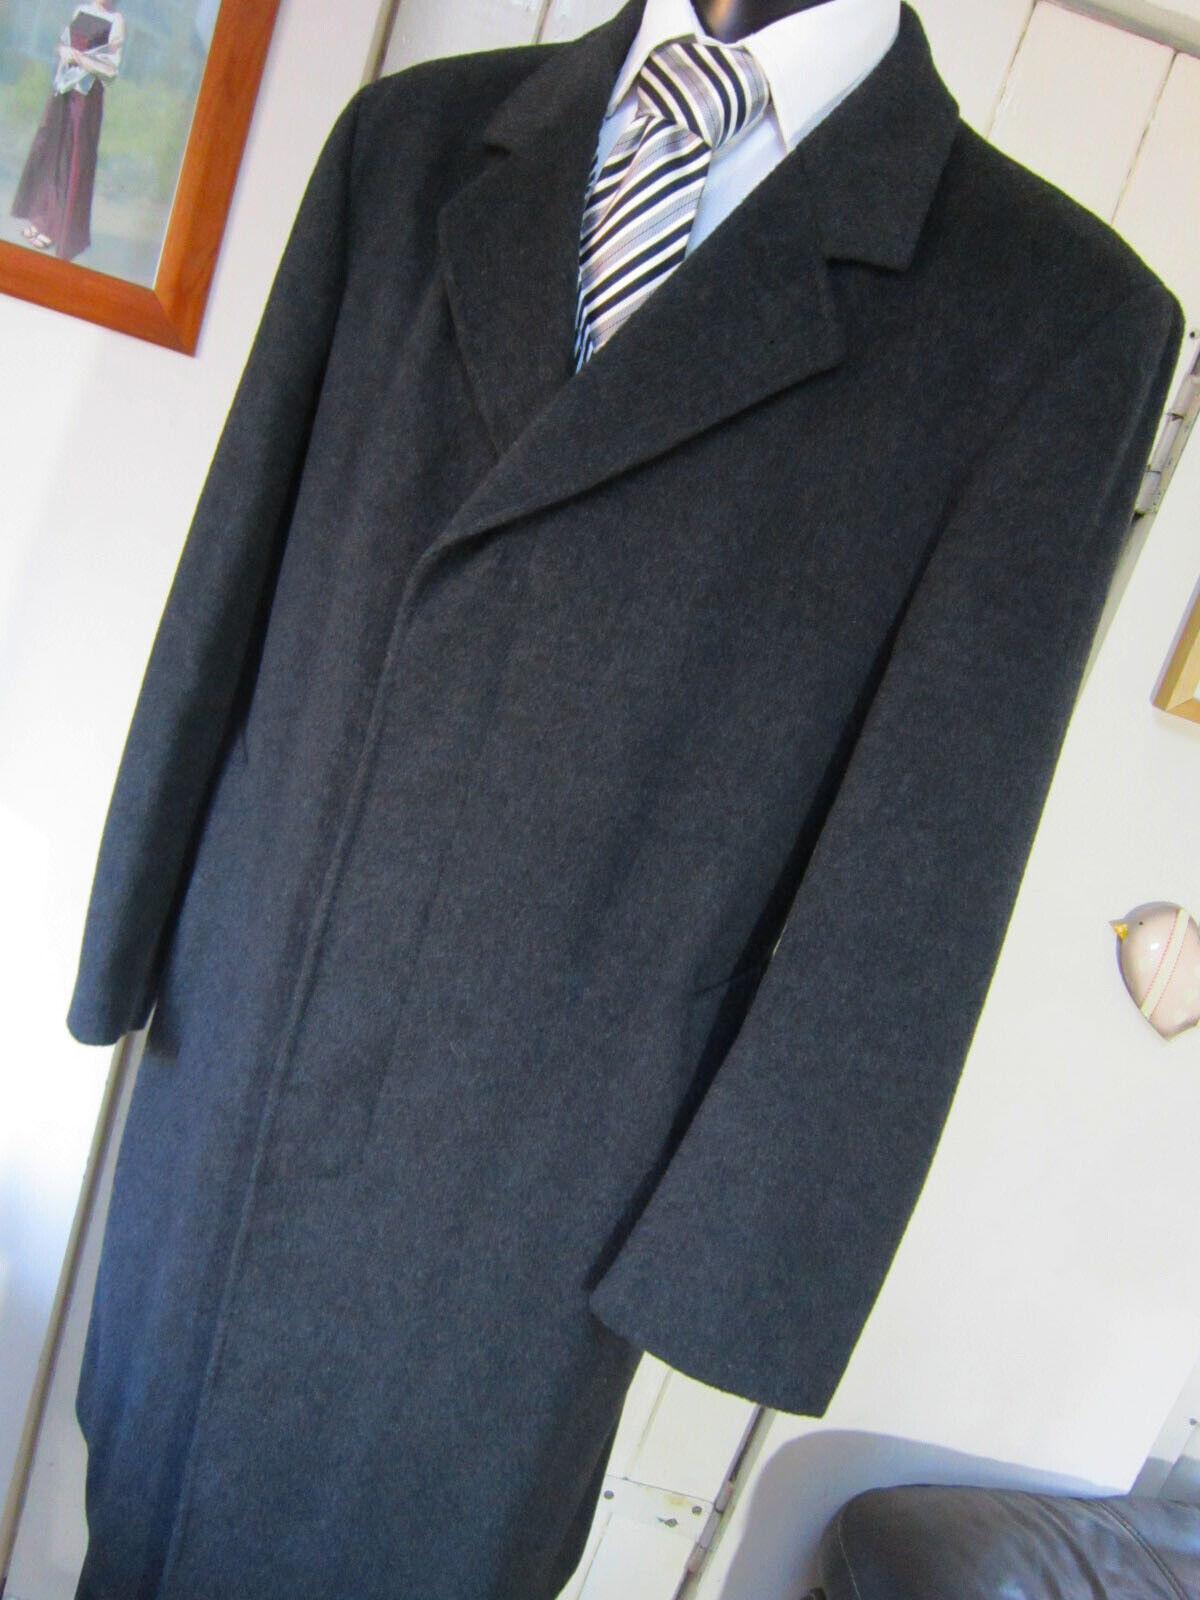 Beatties Charcoal Grey Wool mix Overcoat UK Large 42R Pristine